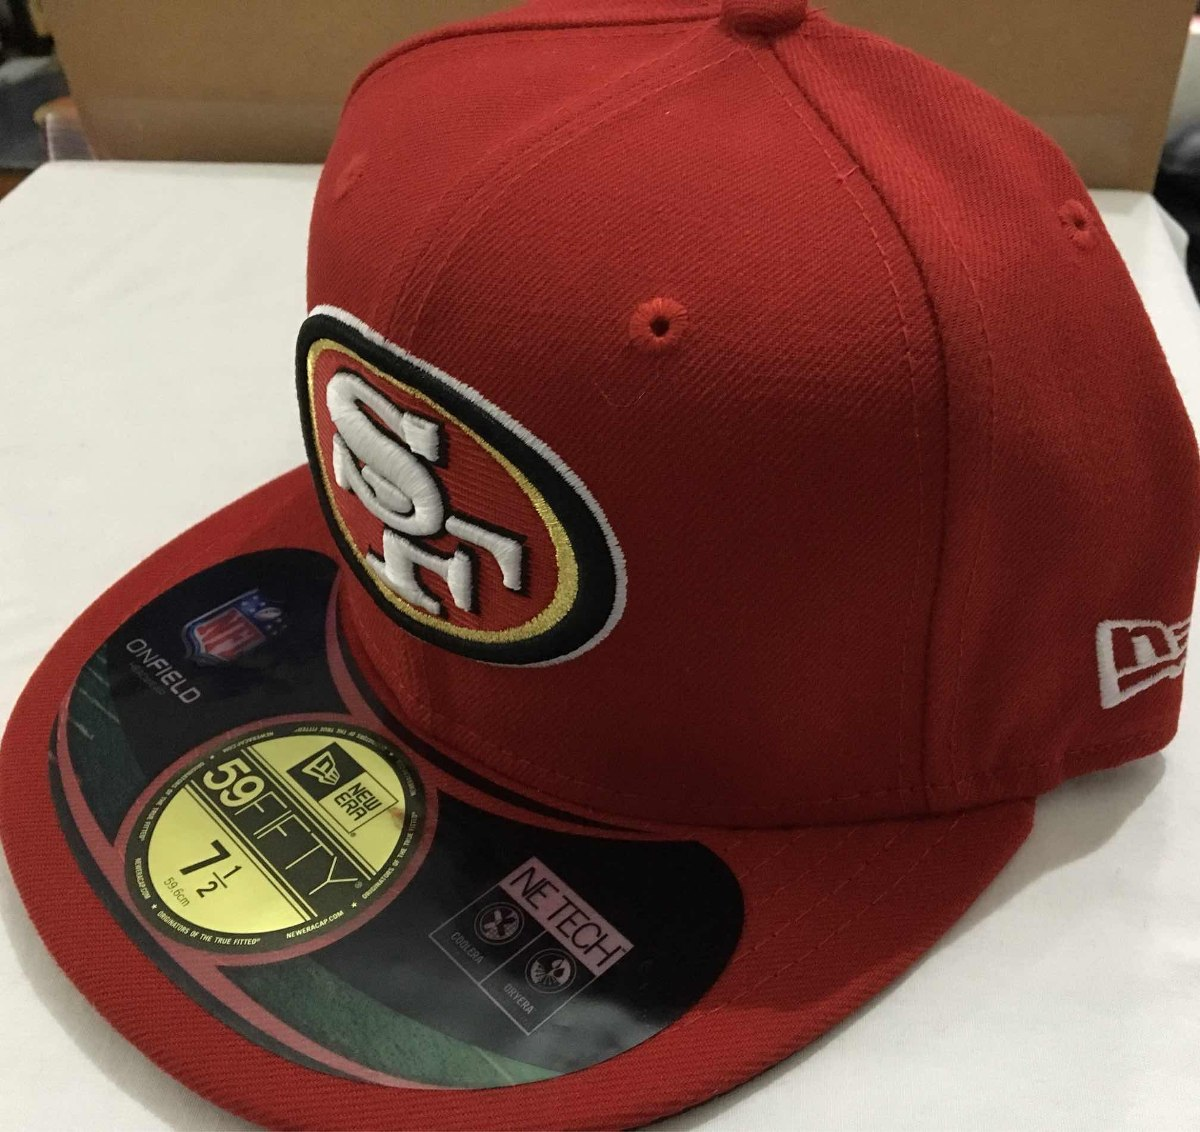 Nfl San Francisco 49ers Niners Gorra New Era 7 1 2 -   680.00 en ... 26118161f2c